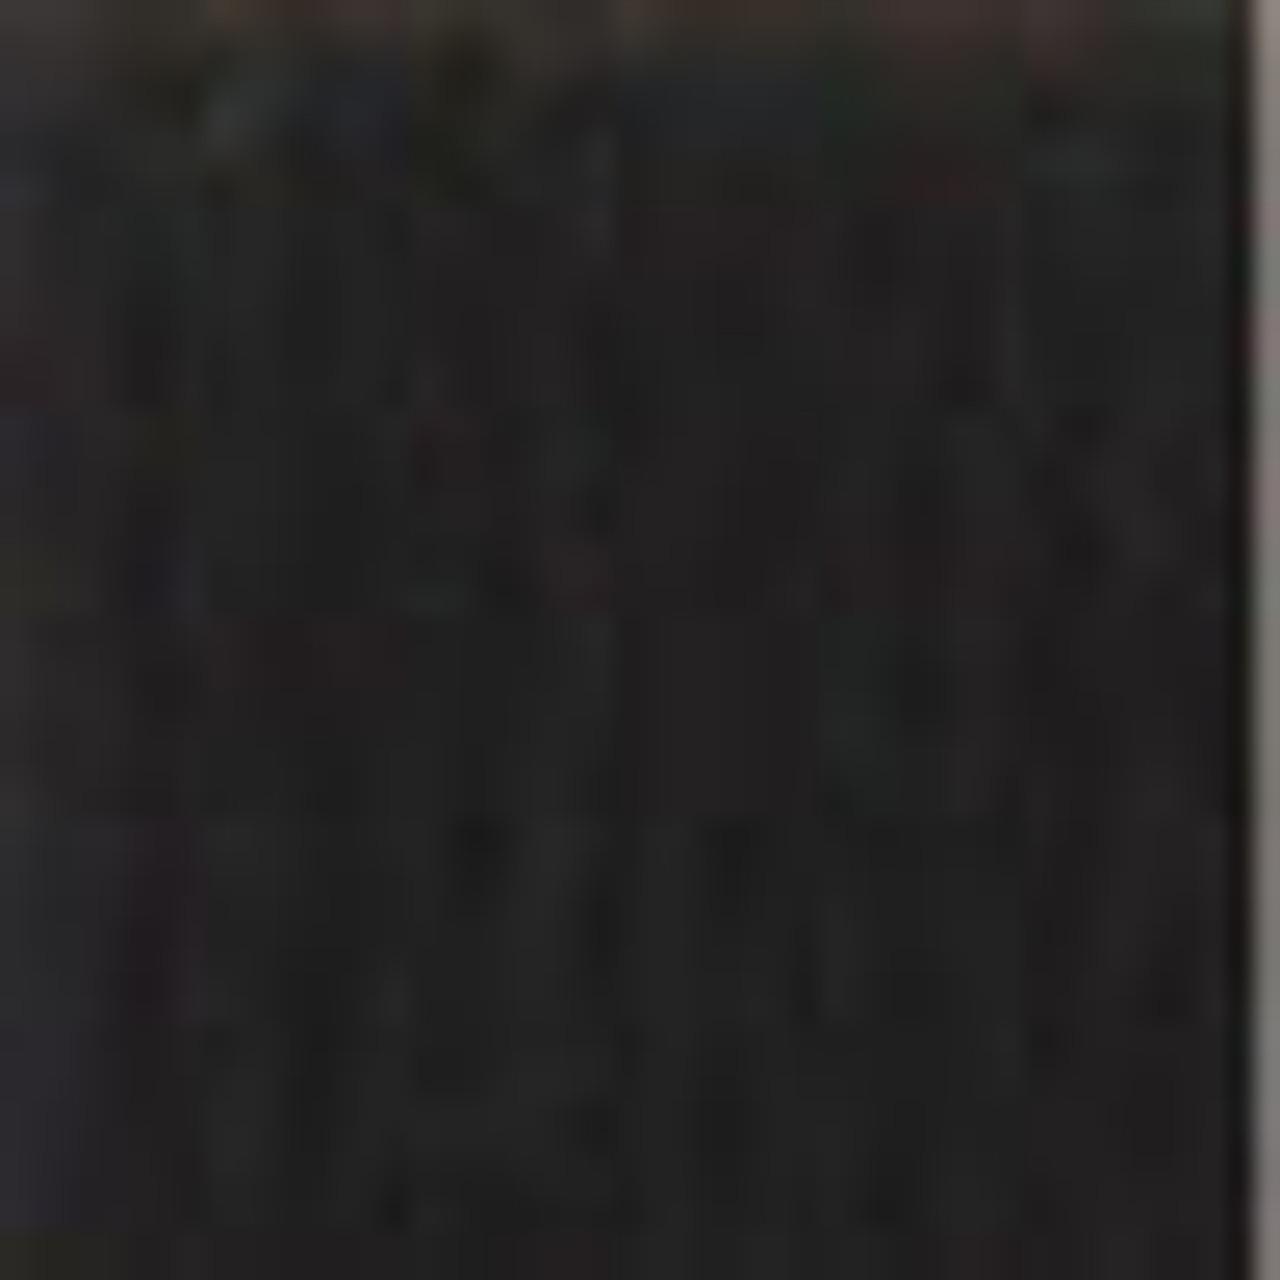 Box of DMC # 310 Black Floss / Thread (12 Skeins)